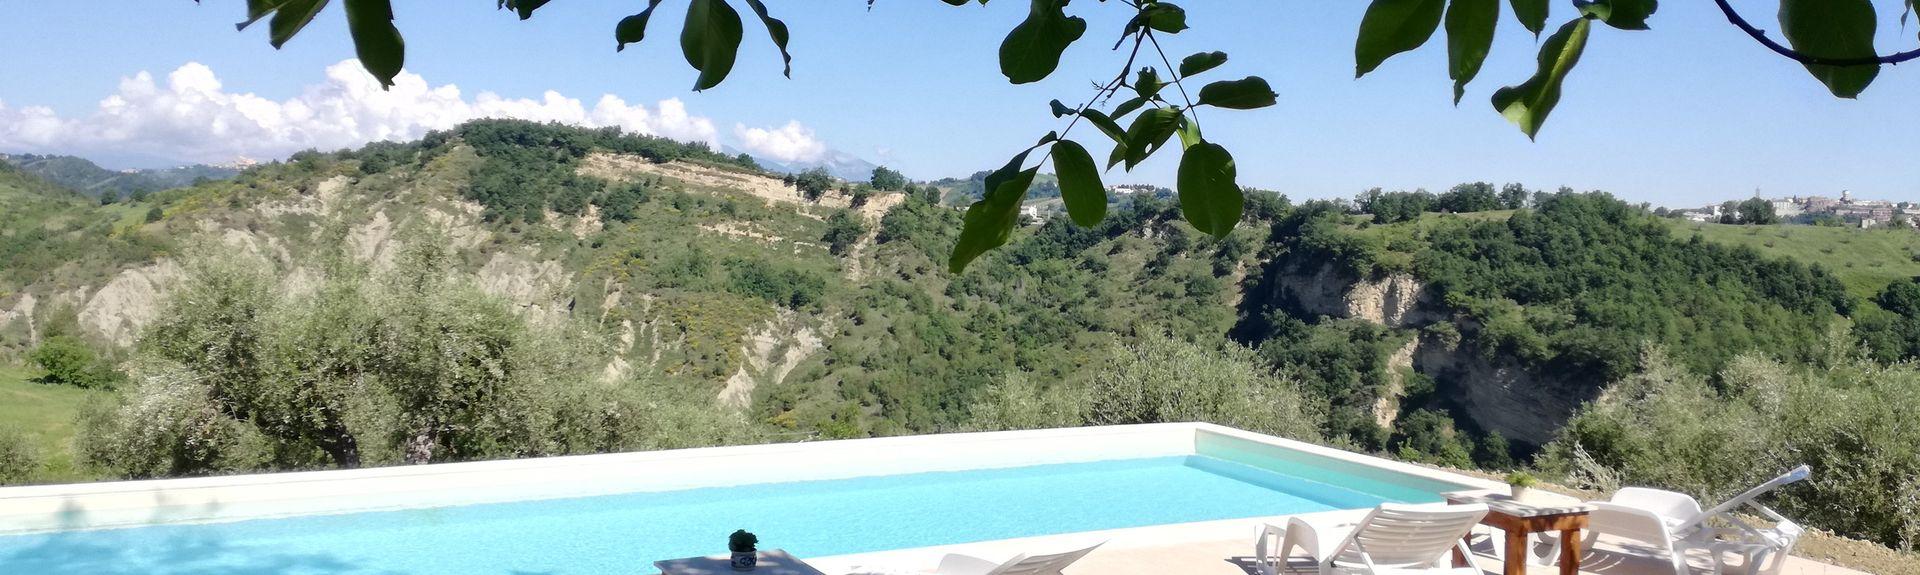 Colledara, Teramo, Abruzzo, Italy